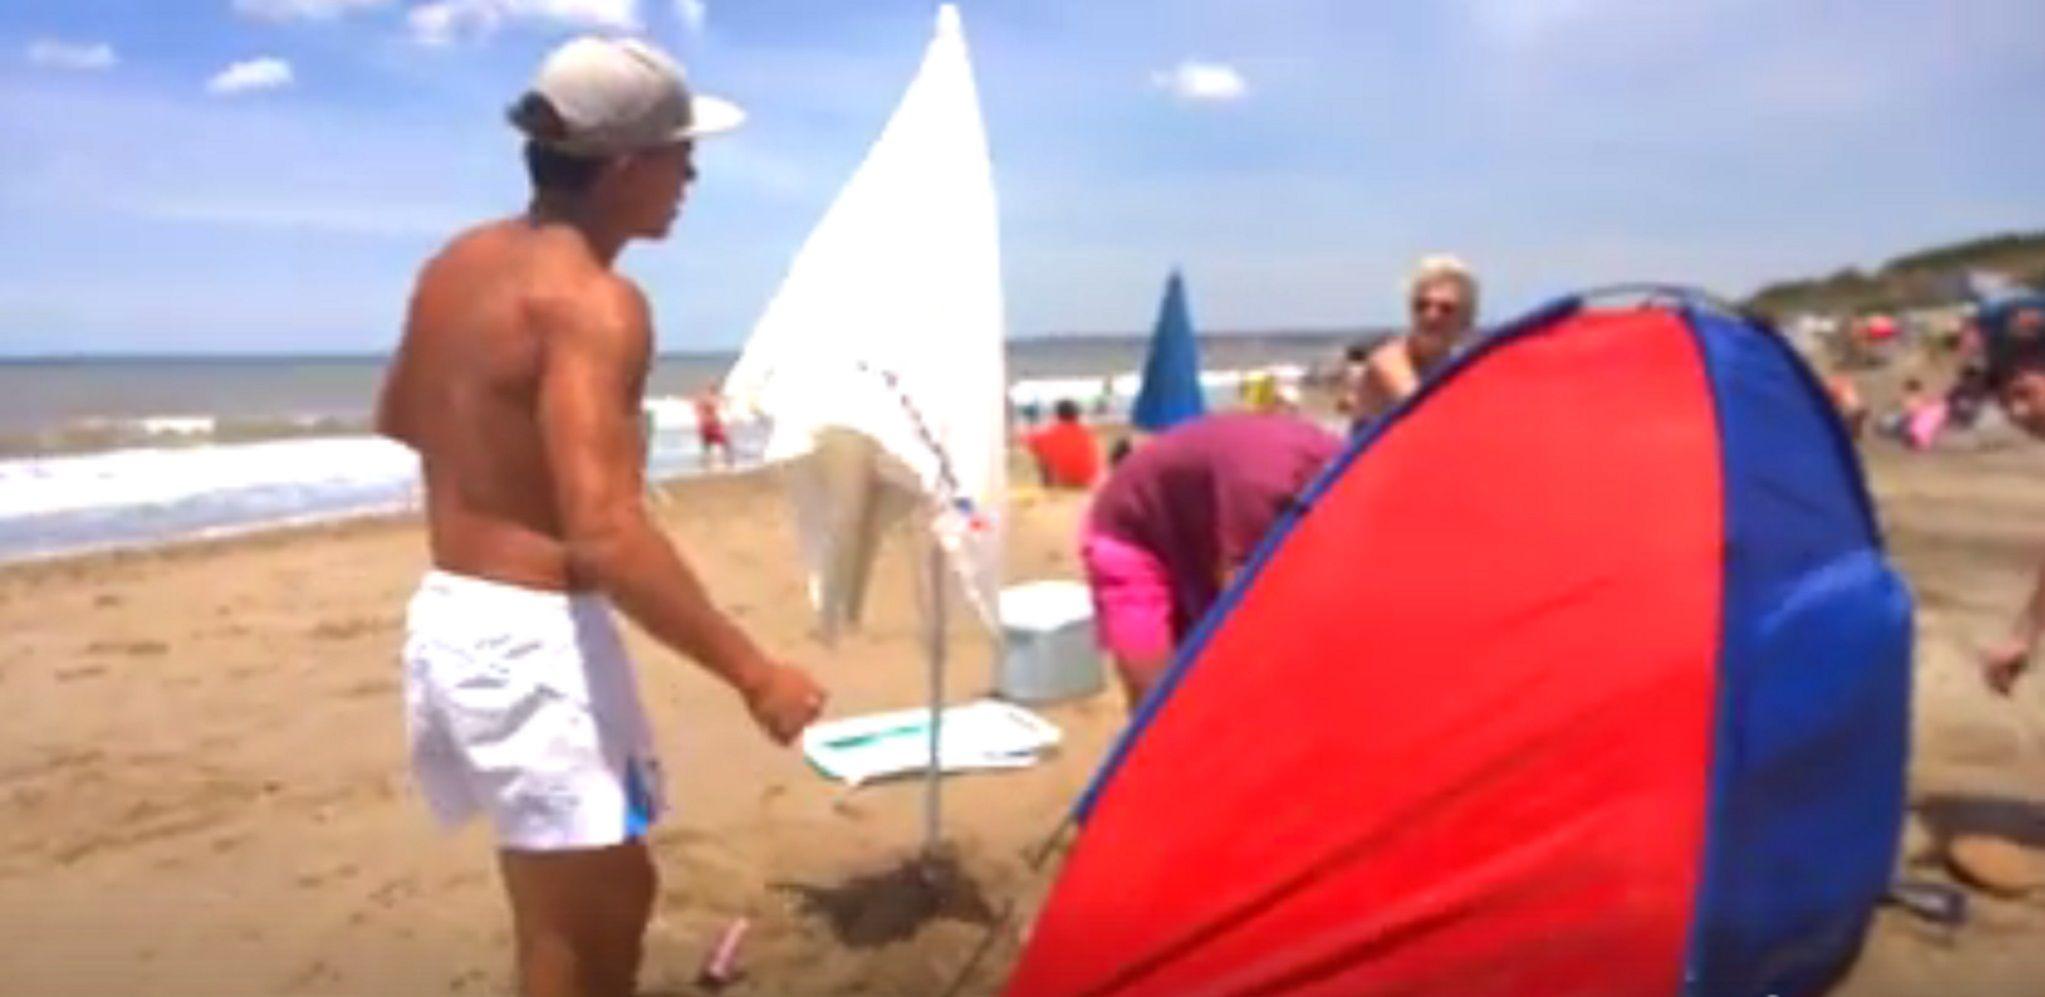 Quisieron echar a una familia de una playa pública